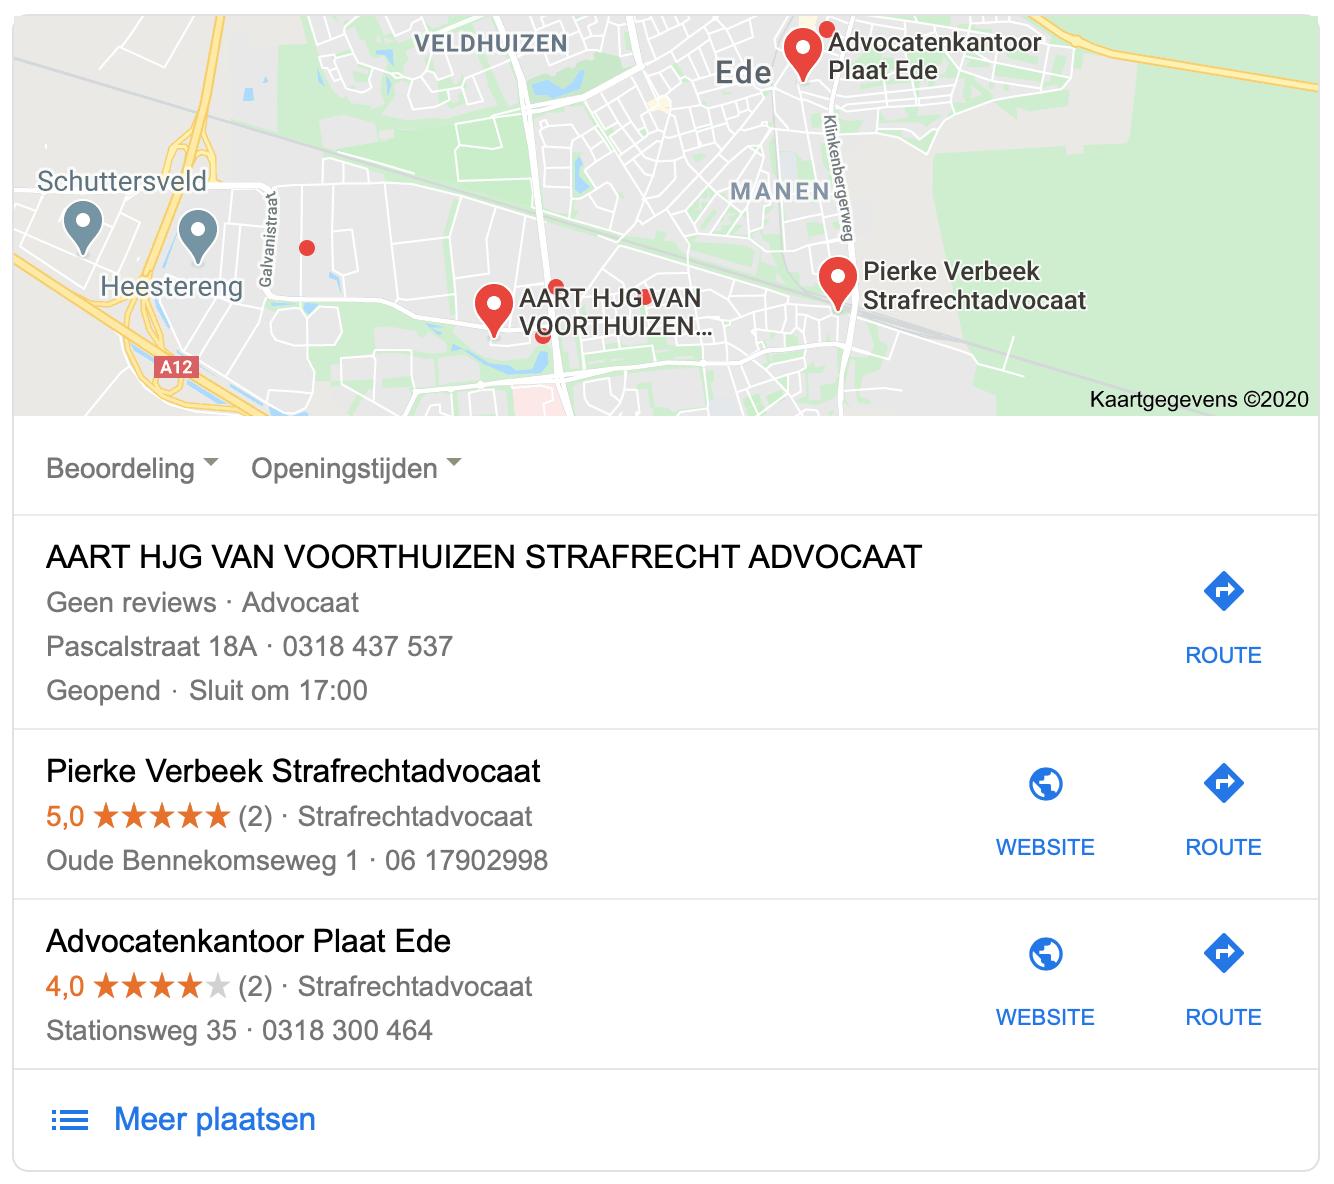 Gevonden worden in Google Maps